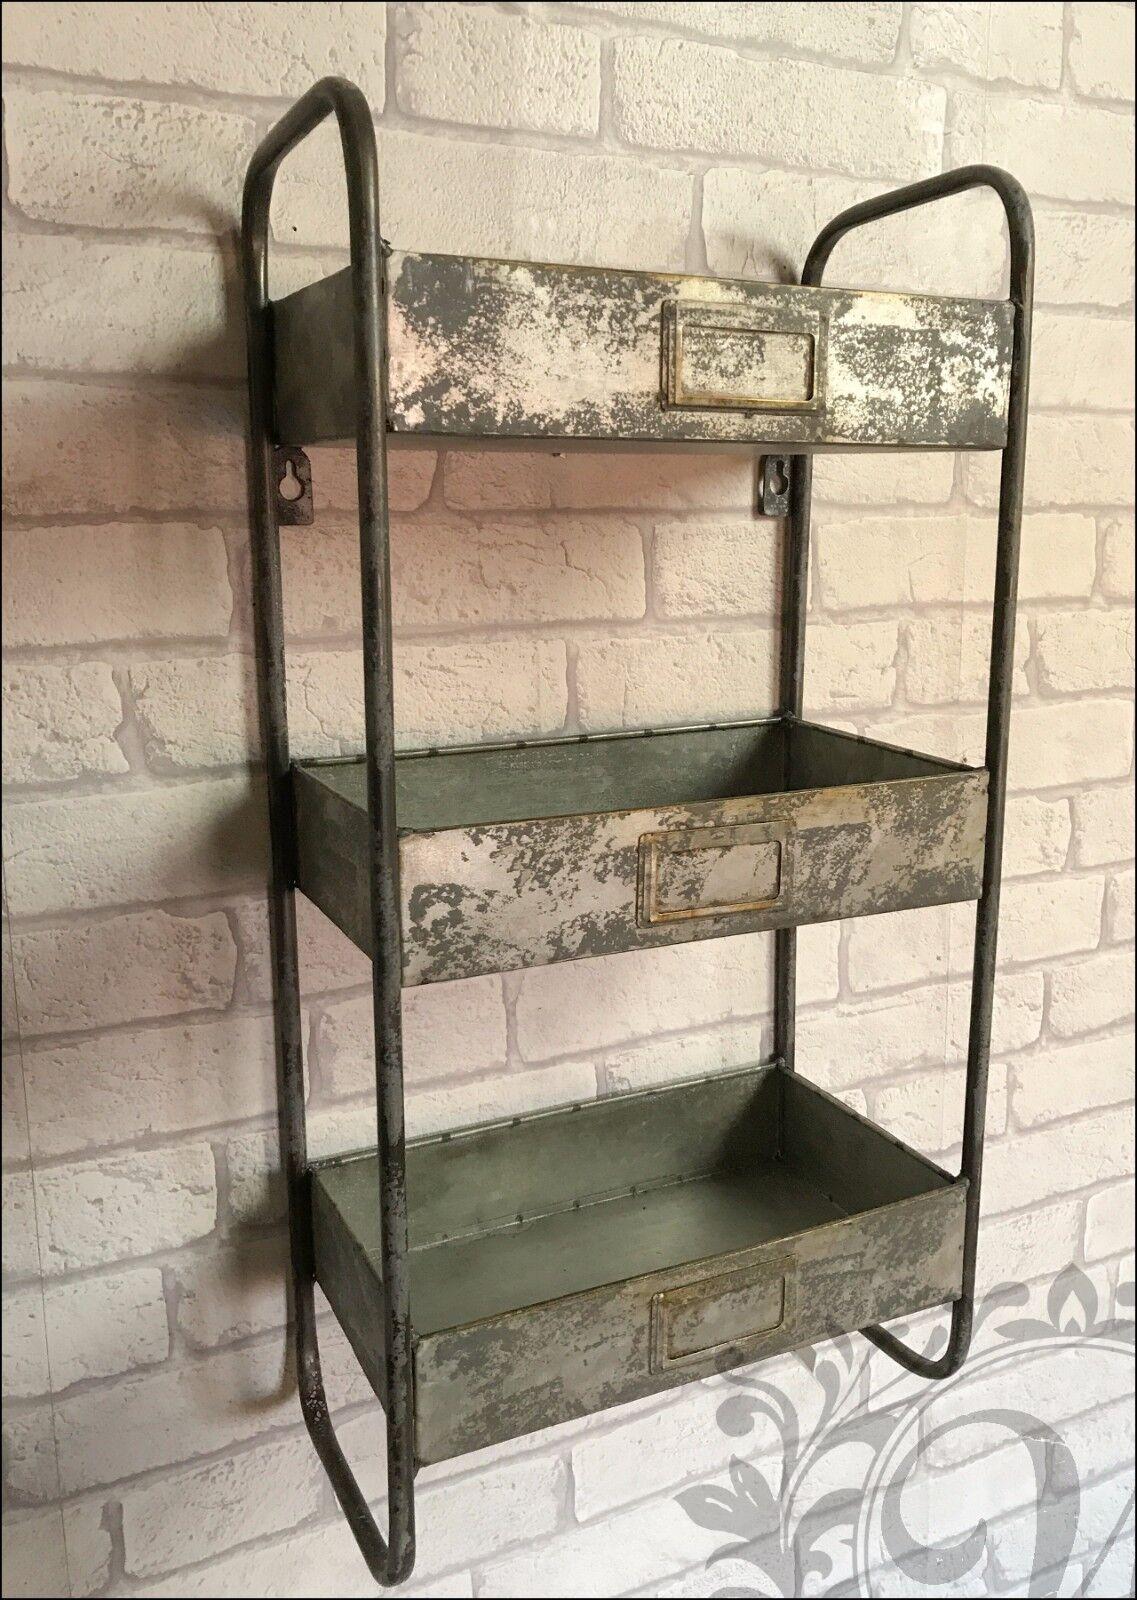 Retro Vintage Industrial Style Metal Shelves Shelf Storage